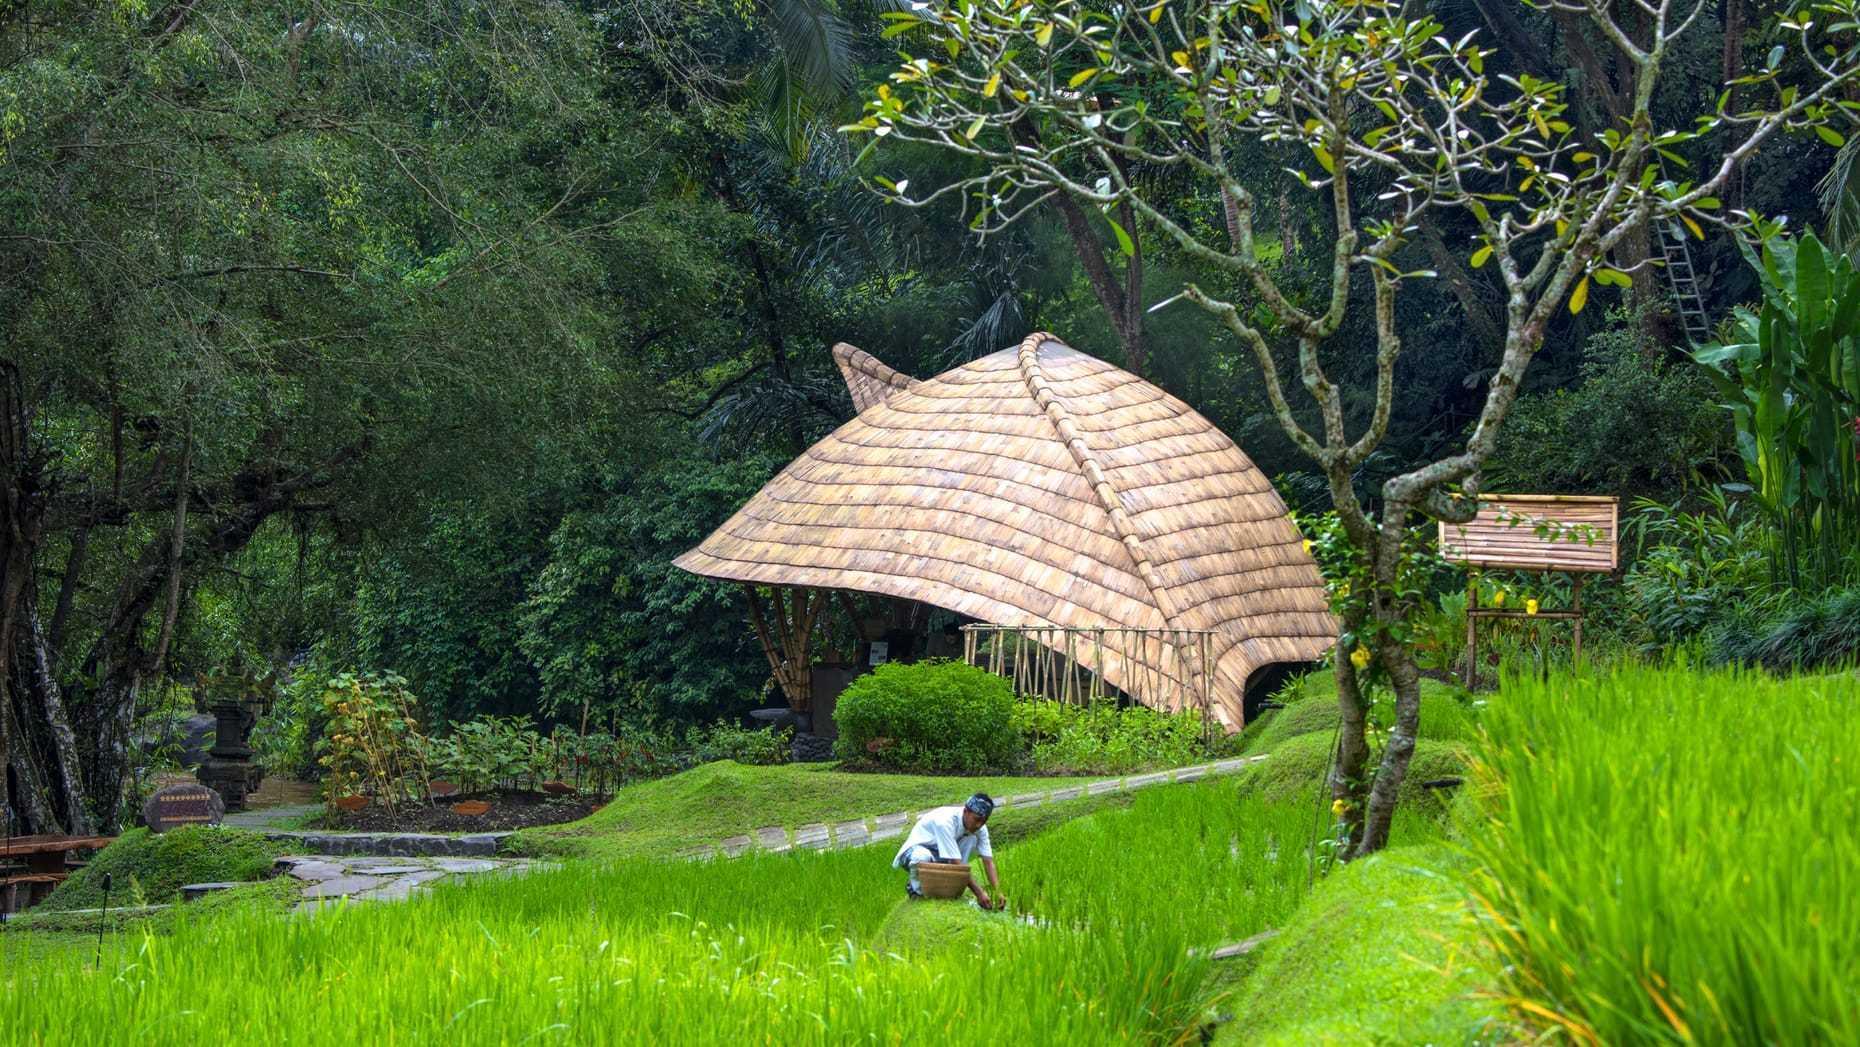 Agung Budi Raharsa | Architecture & Engineering Sokasi Bamboo Cooking Class / School - Bali Bali, Indonesia Bali, Indonesia Elevation  88745